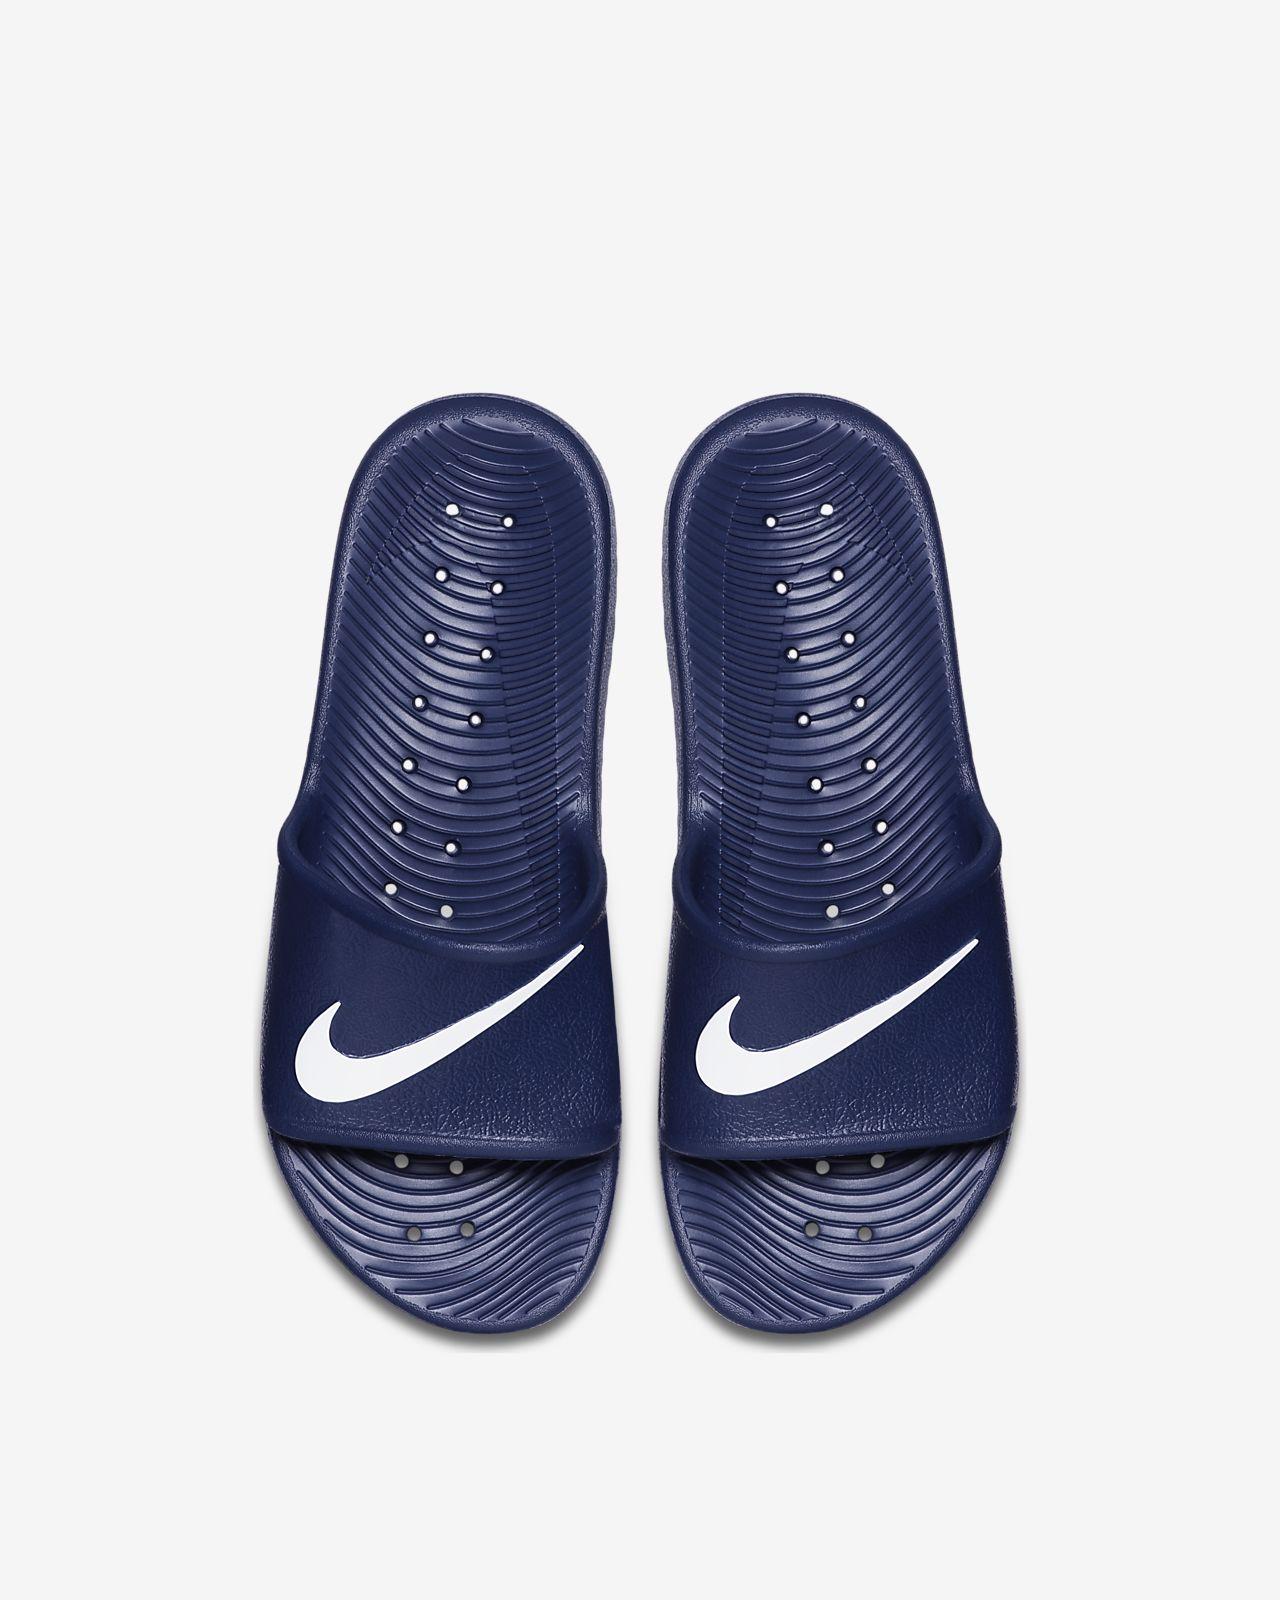 info for 6d11d 43af9 ... Nike Kawa Shower Chanclas - Hombre